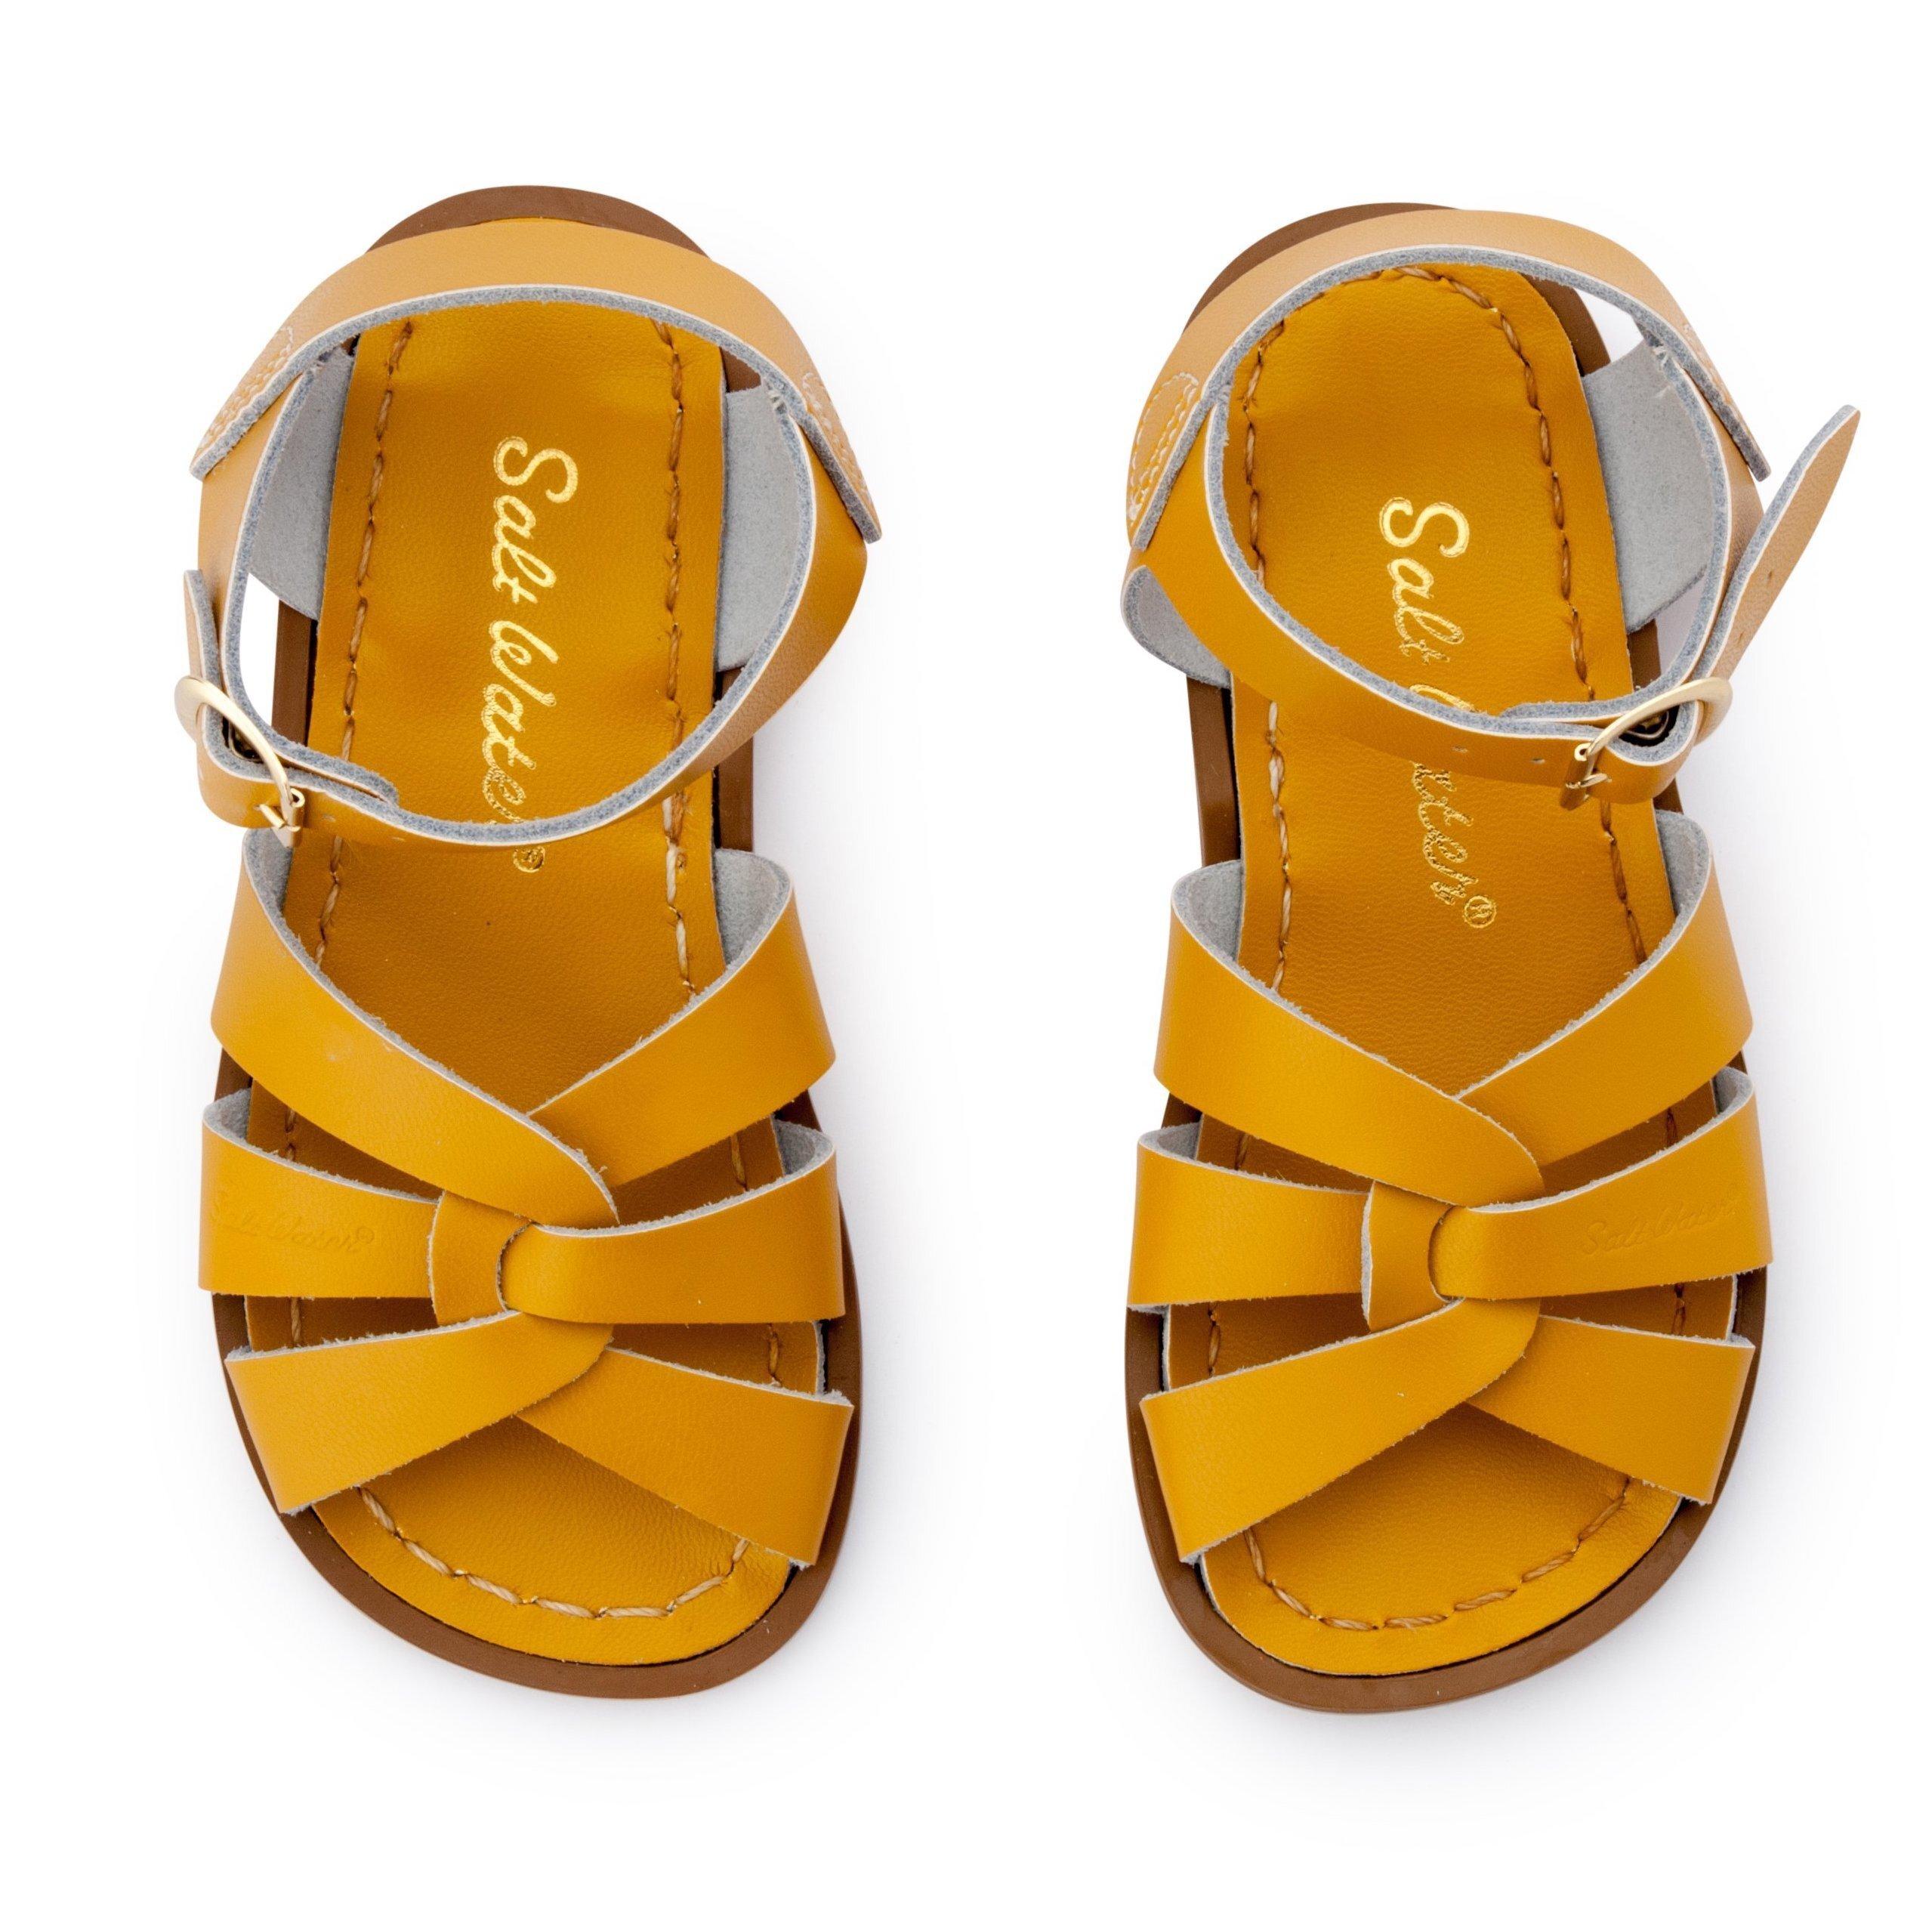 71437dcffa20 Saltwater Sandal Original - Mustard - FOOTWEAR-Boy   Kid Republic ...